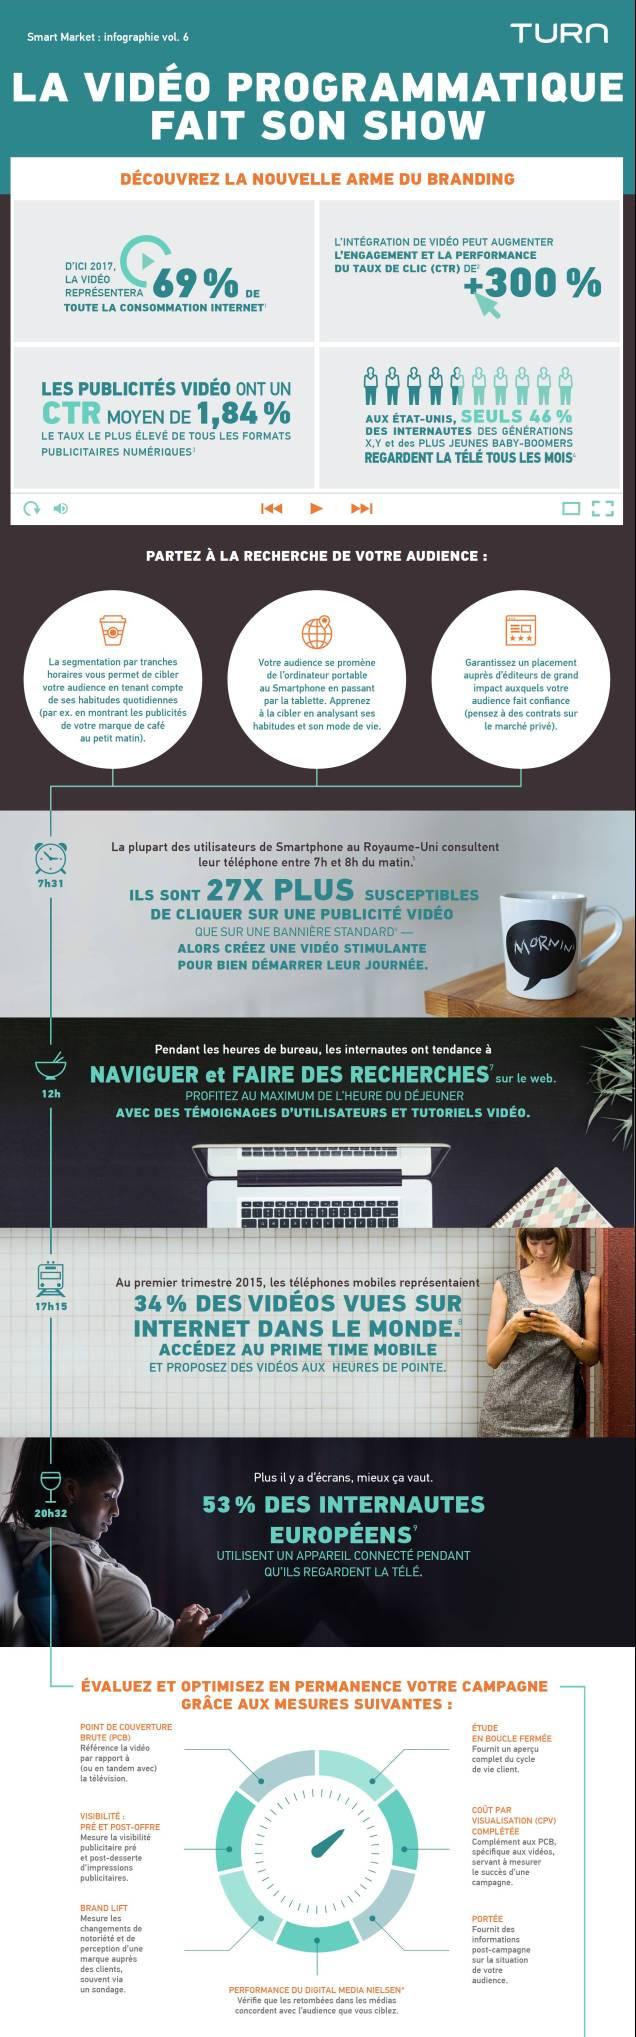 Programmatic video trends